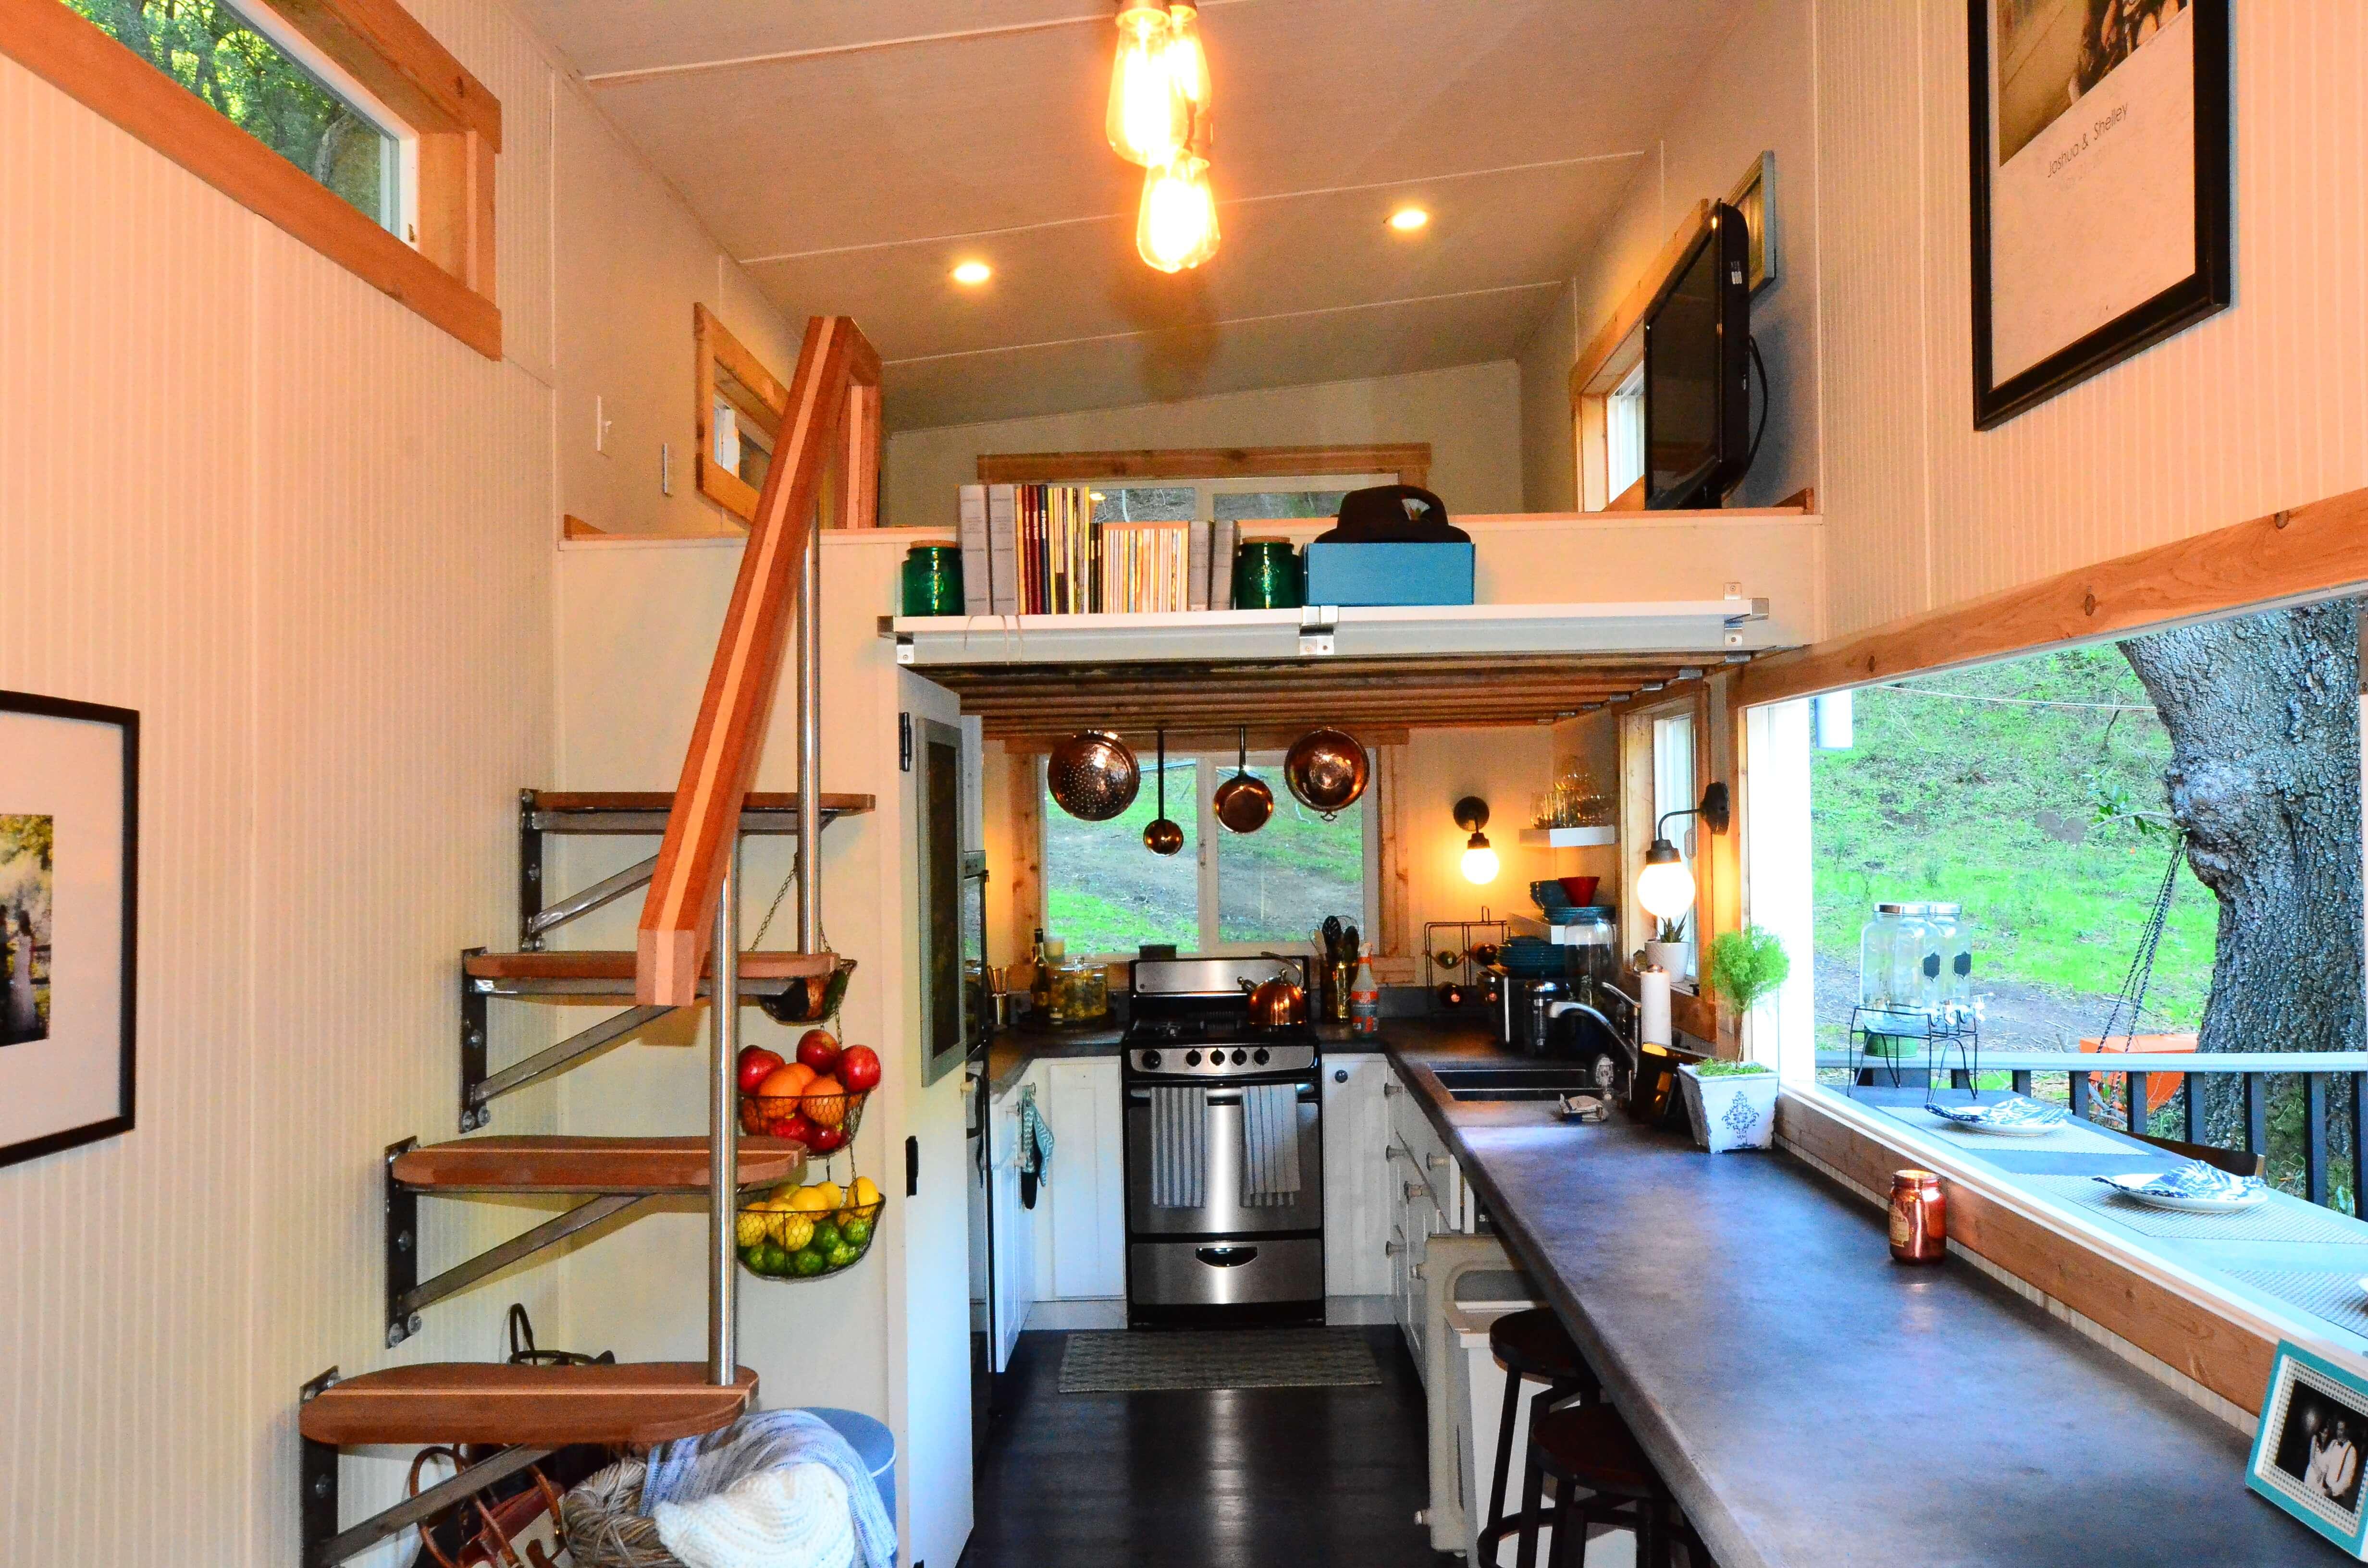 Wondrous Tiny House Walk Through Interior Tiny House Basics Largest Home Design Picture Inspirations Pitcheantrous